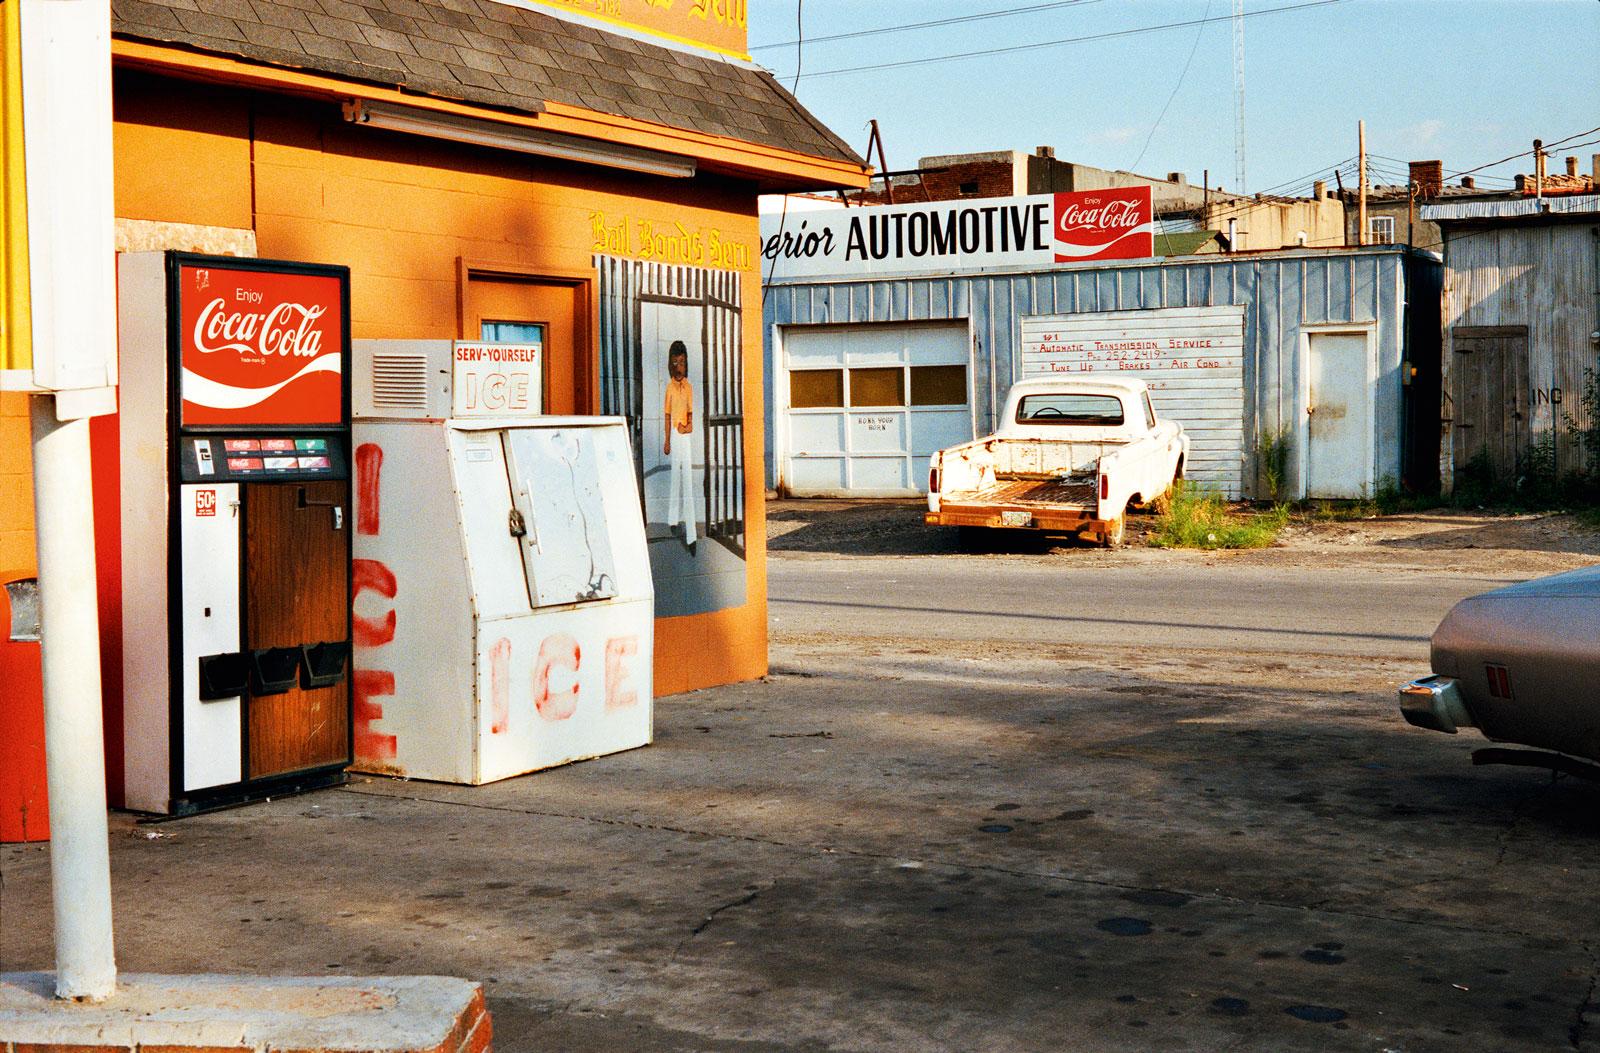 photographersbooks-william-egglestone-43.JPG